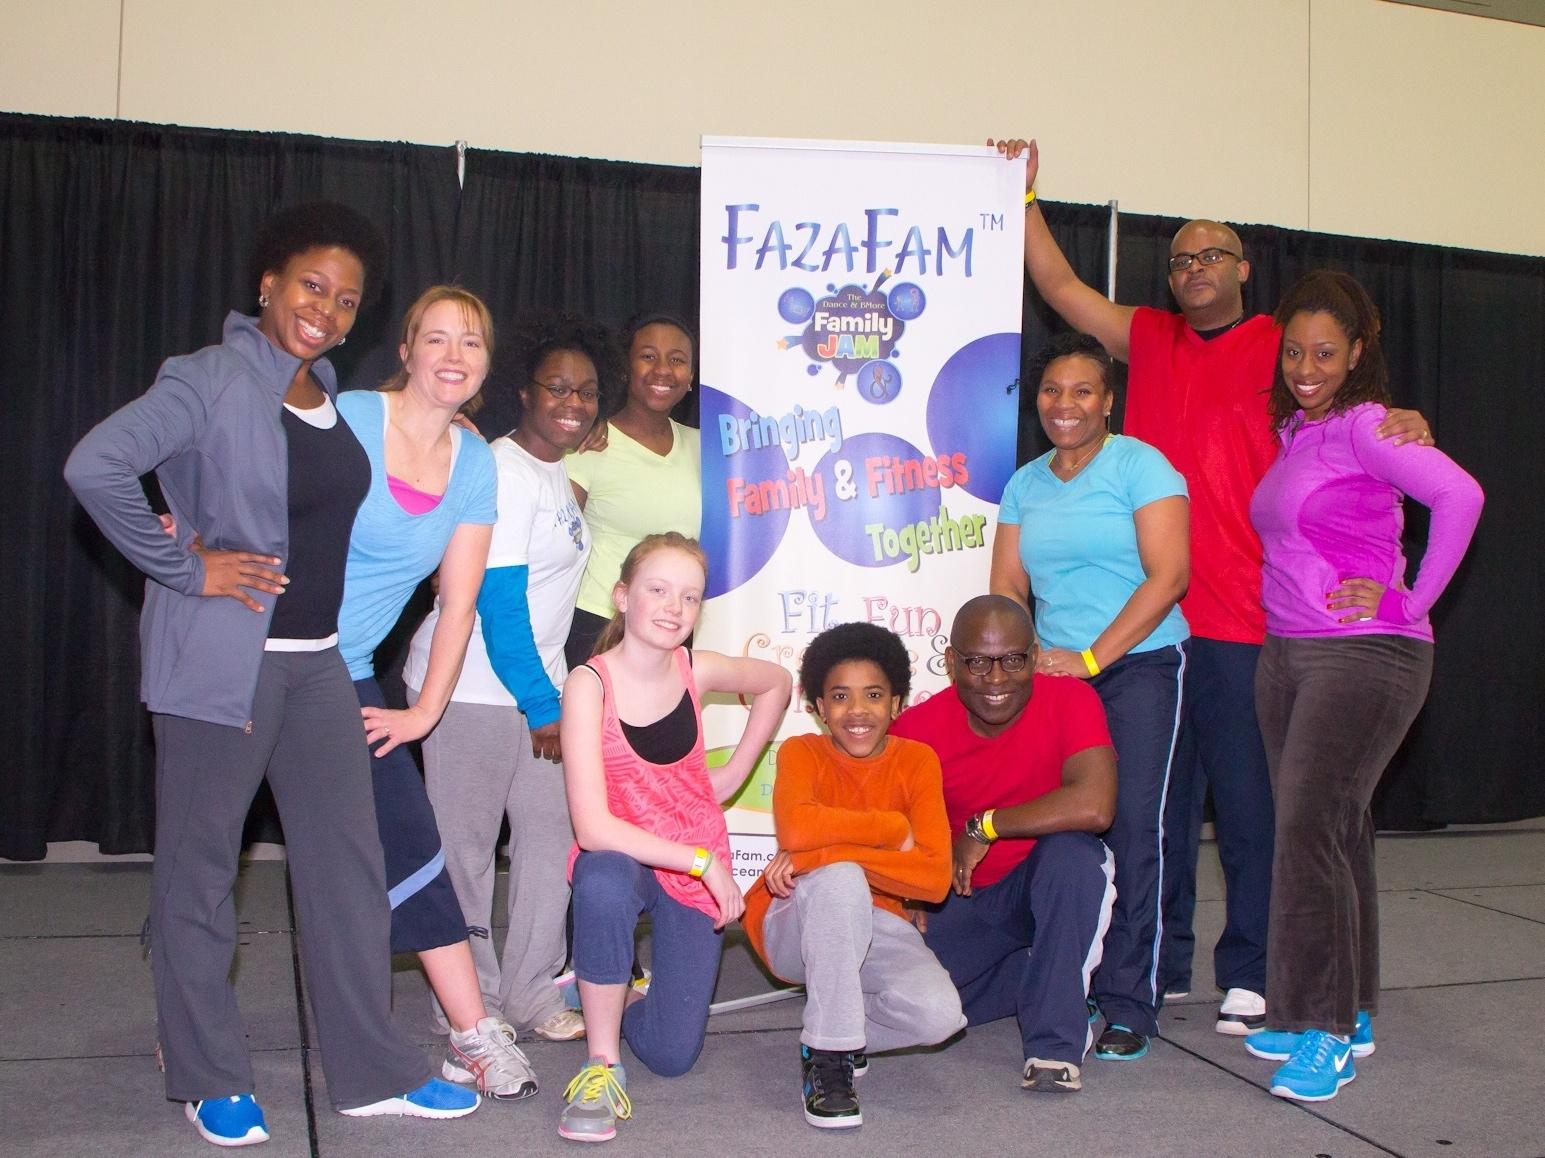 Dance & Bmore programs FazaFam